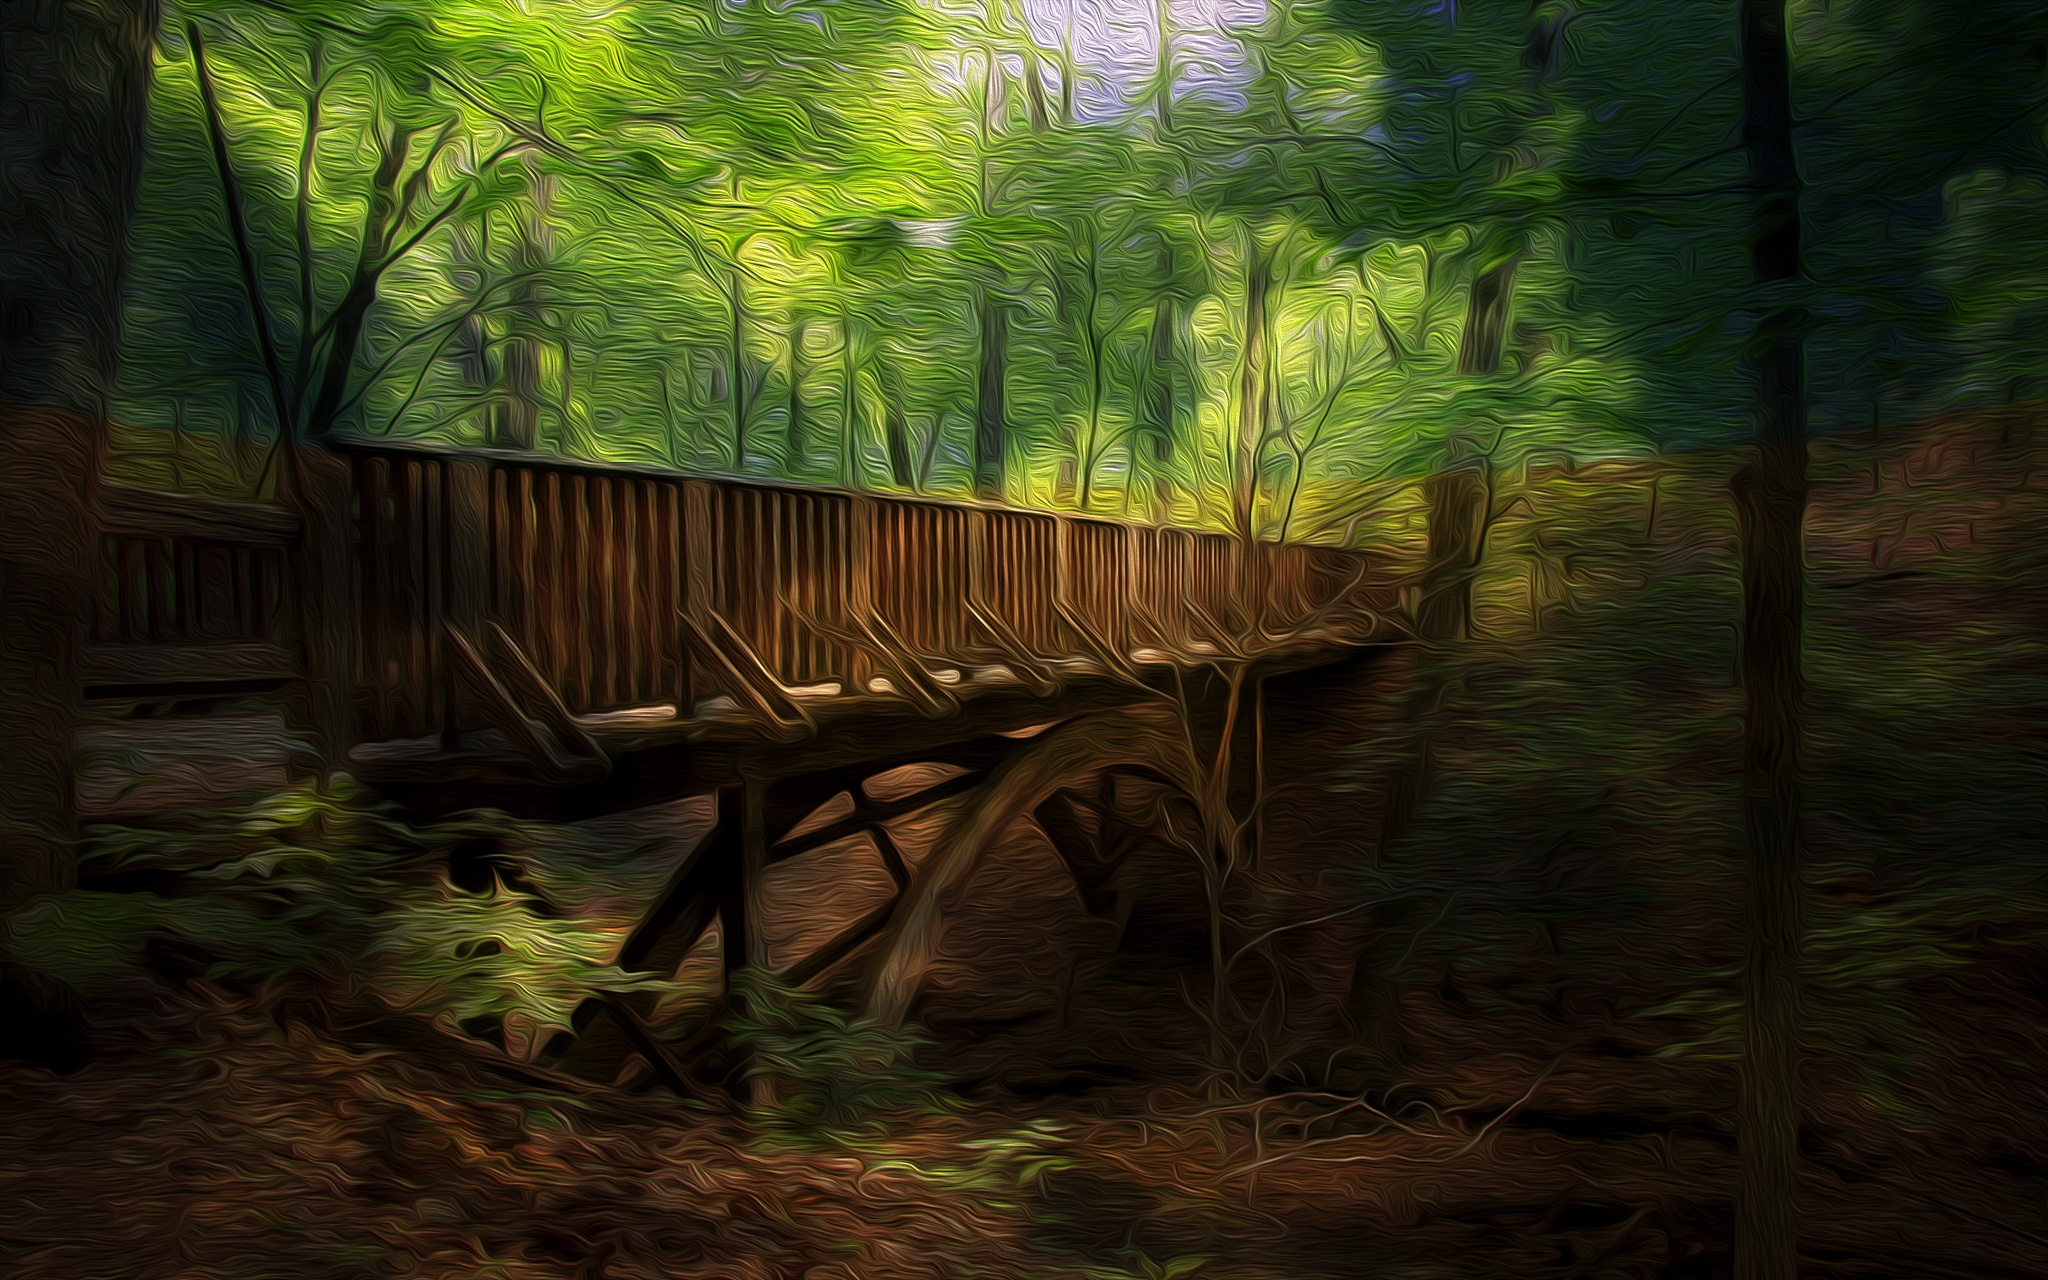 The Wooden Bridge by John Hill